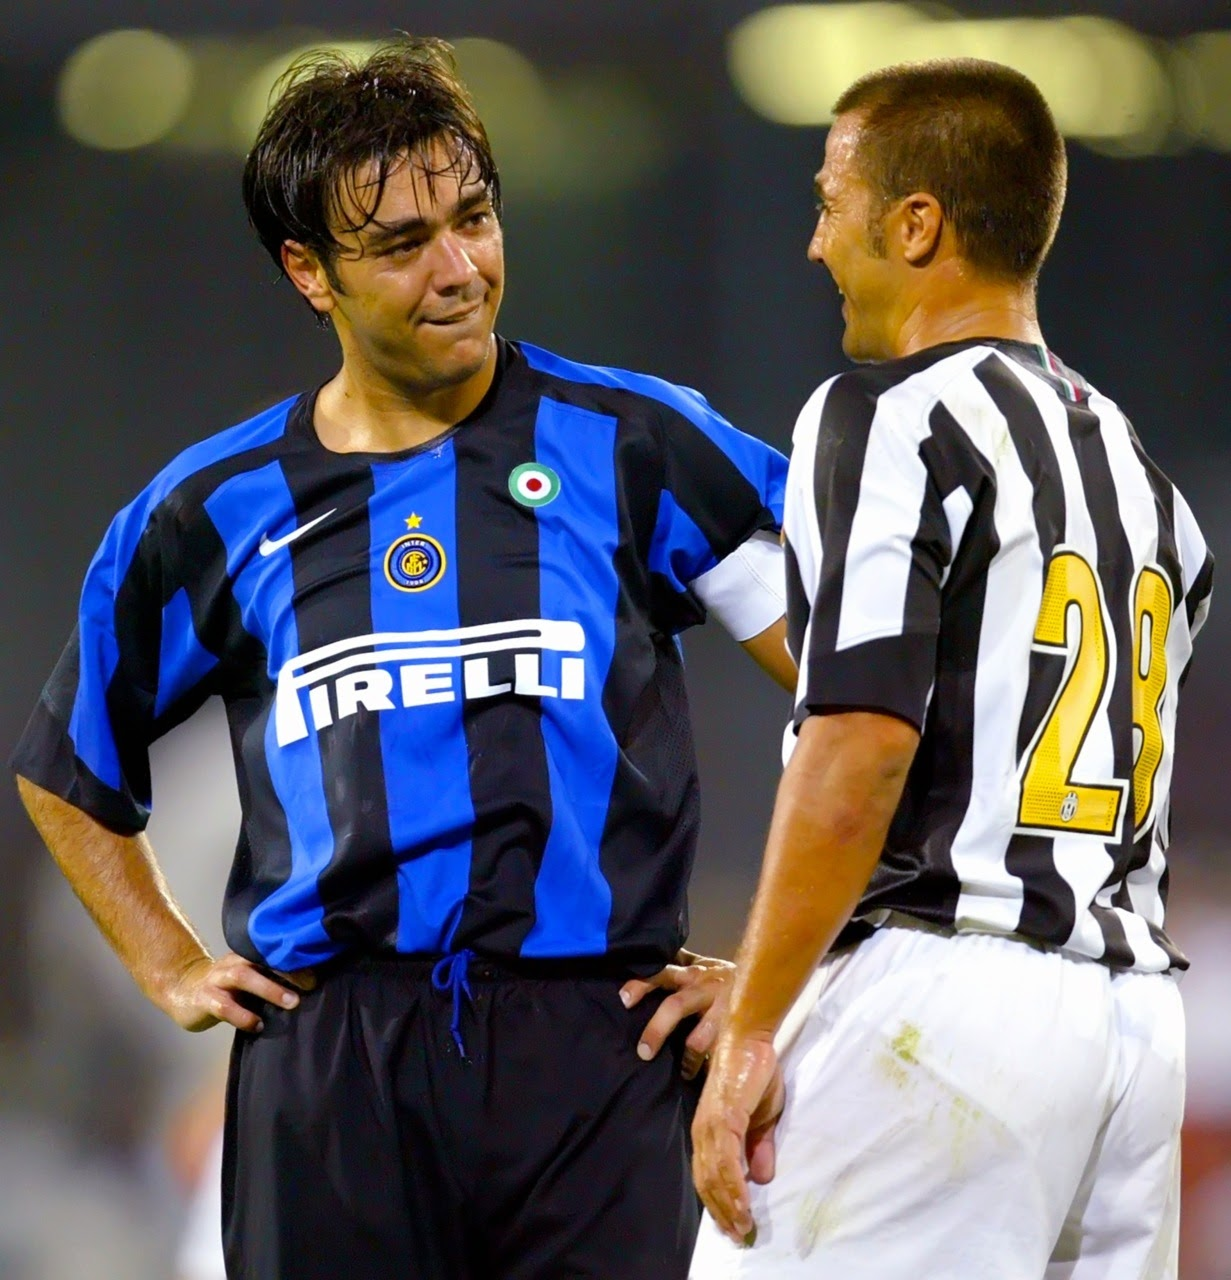 Fabio and Ronaldo Fabio Cannavaro Pinterest